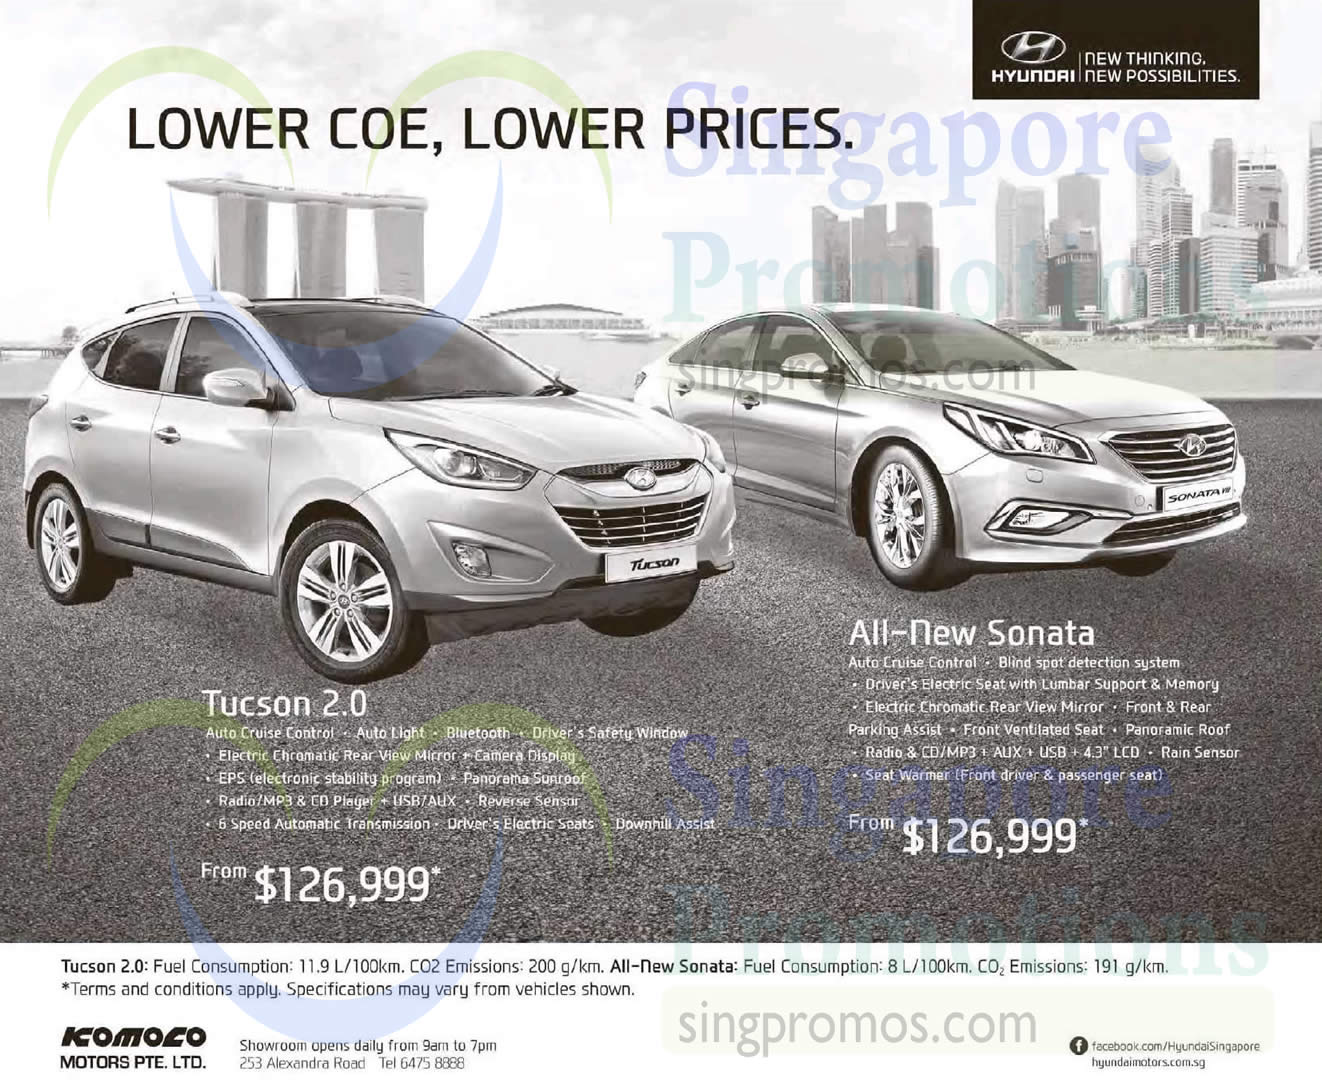 Hyundai Tucson 2 0 Hyundai Sonata Price Features 7 Feb